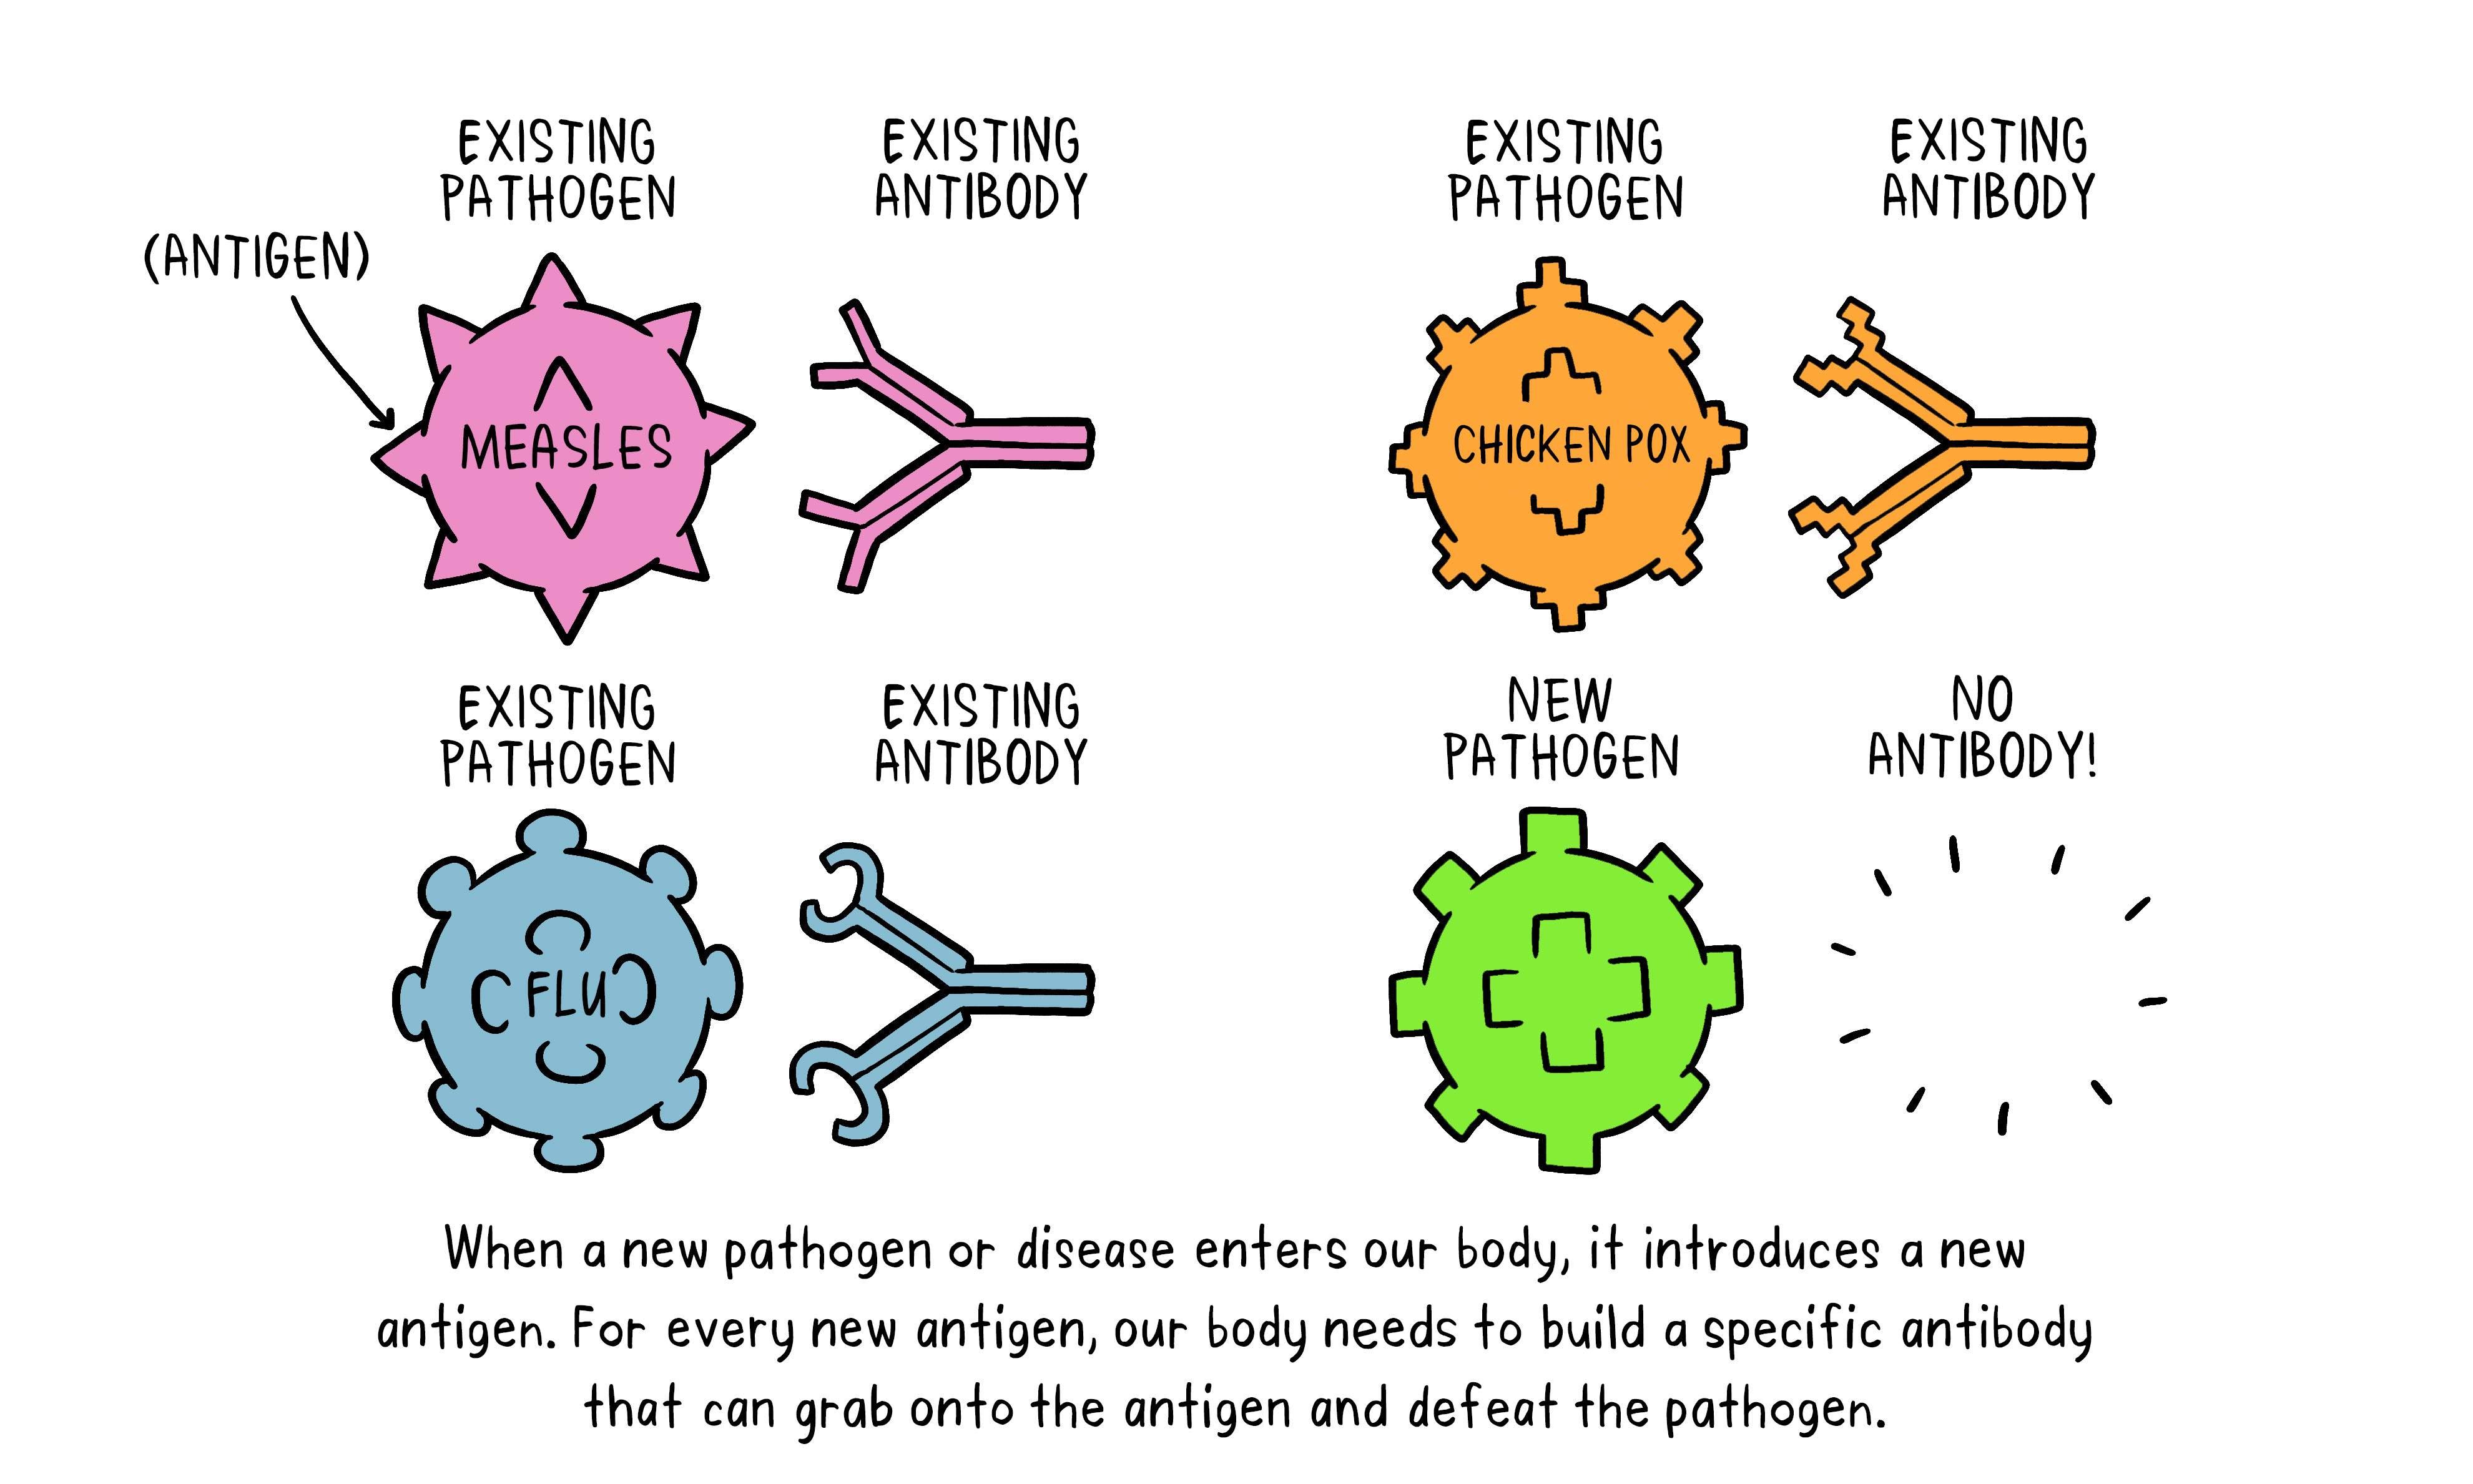 Vaccines Antibody illustration 01_29 Oct